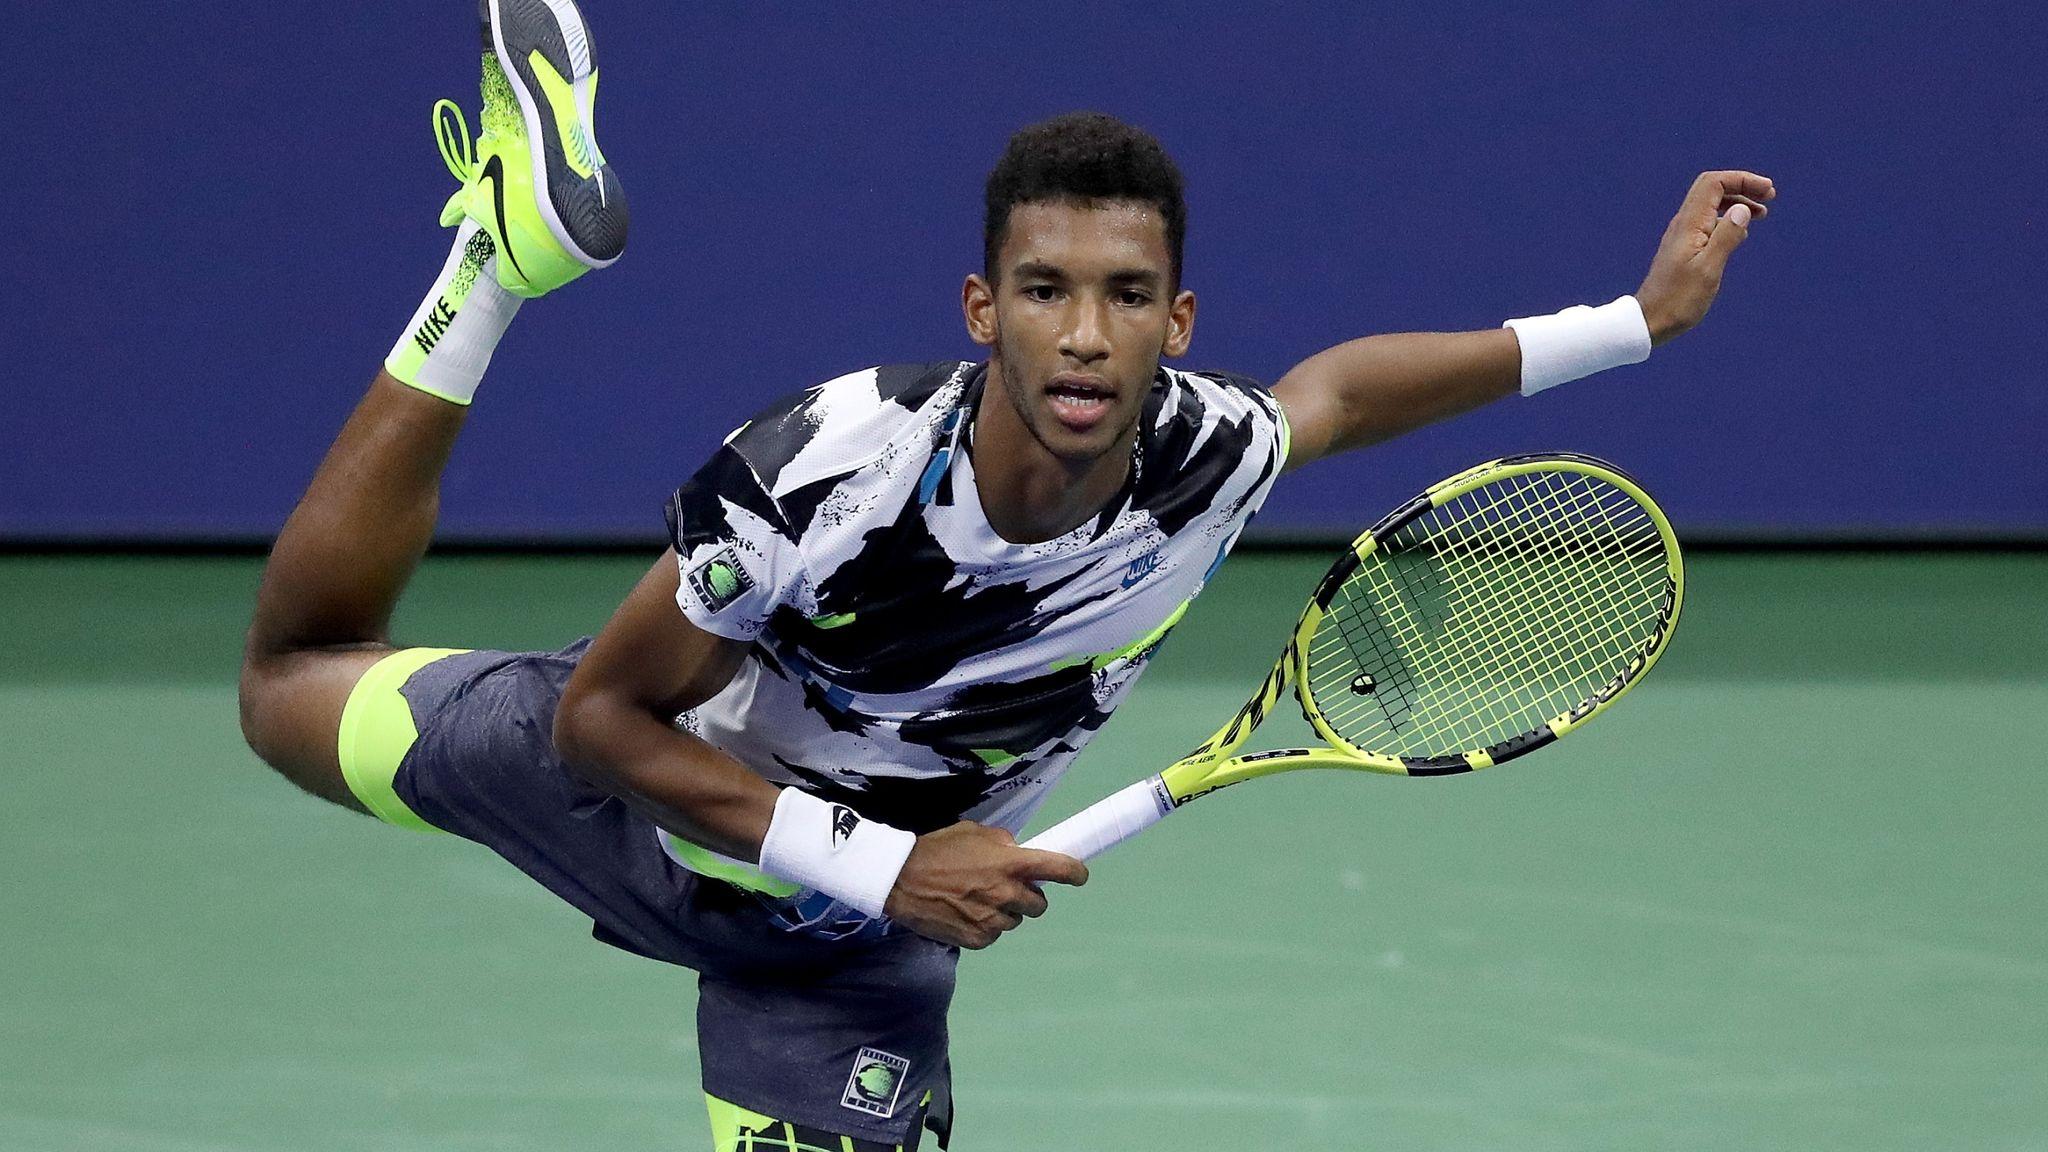 Washington Open 2021: Felix Auger-Aliassime vs. Andreas Seppi Tennis Pick and Prediction